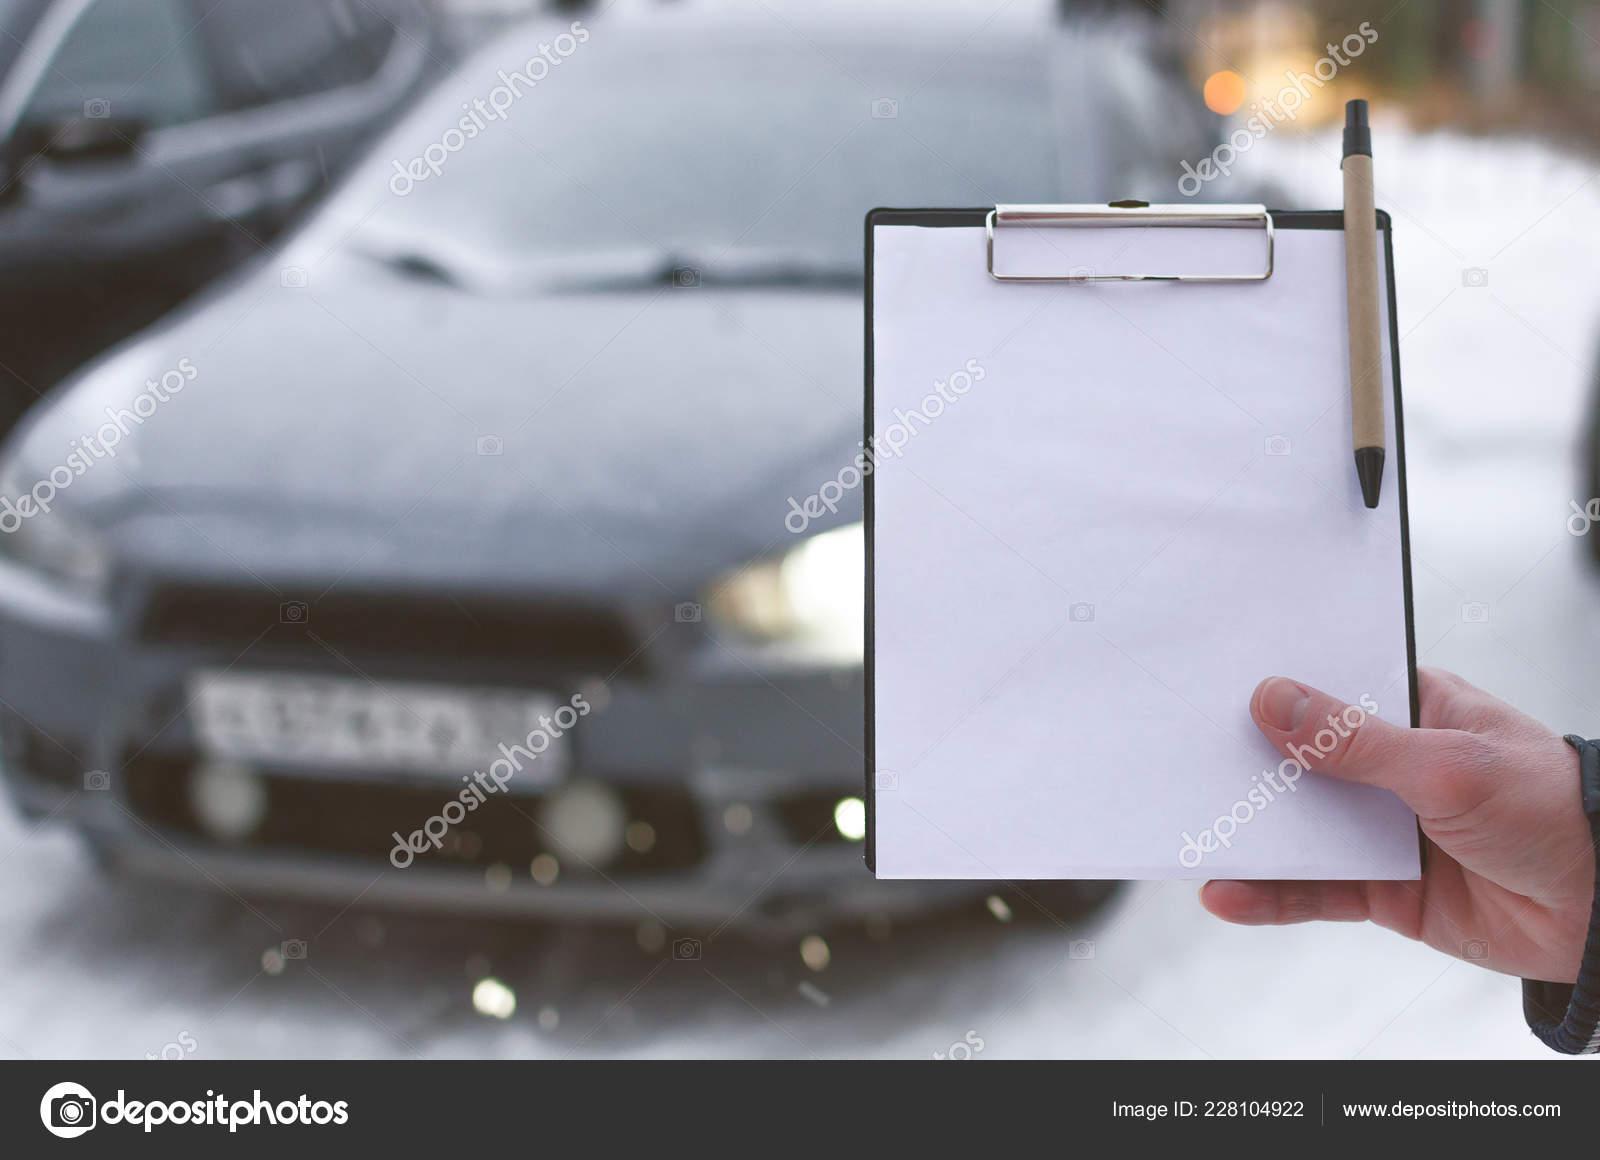 Car Repair Insurance >> Invoice Payment Car Repair Concept Car Insurance Document